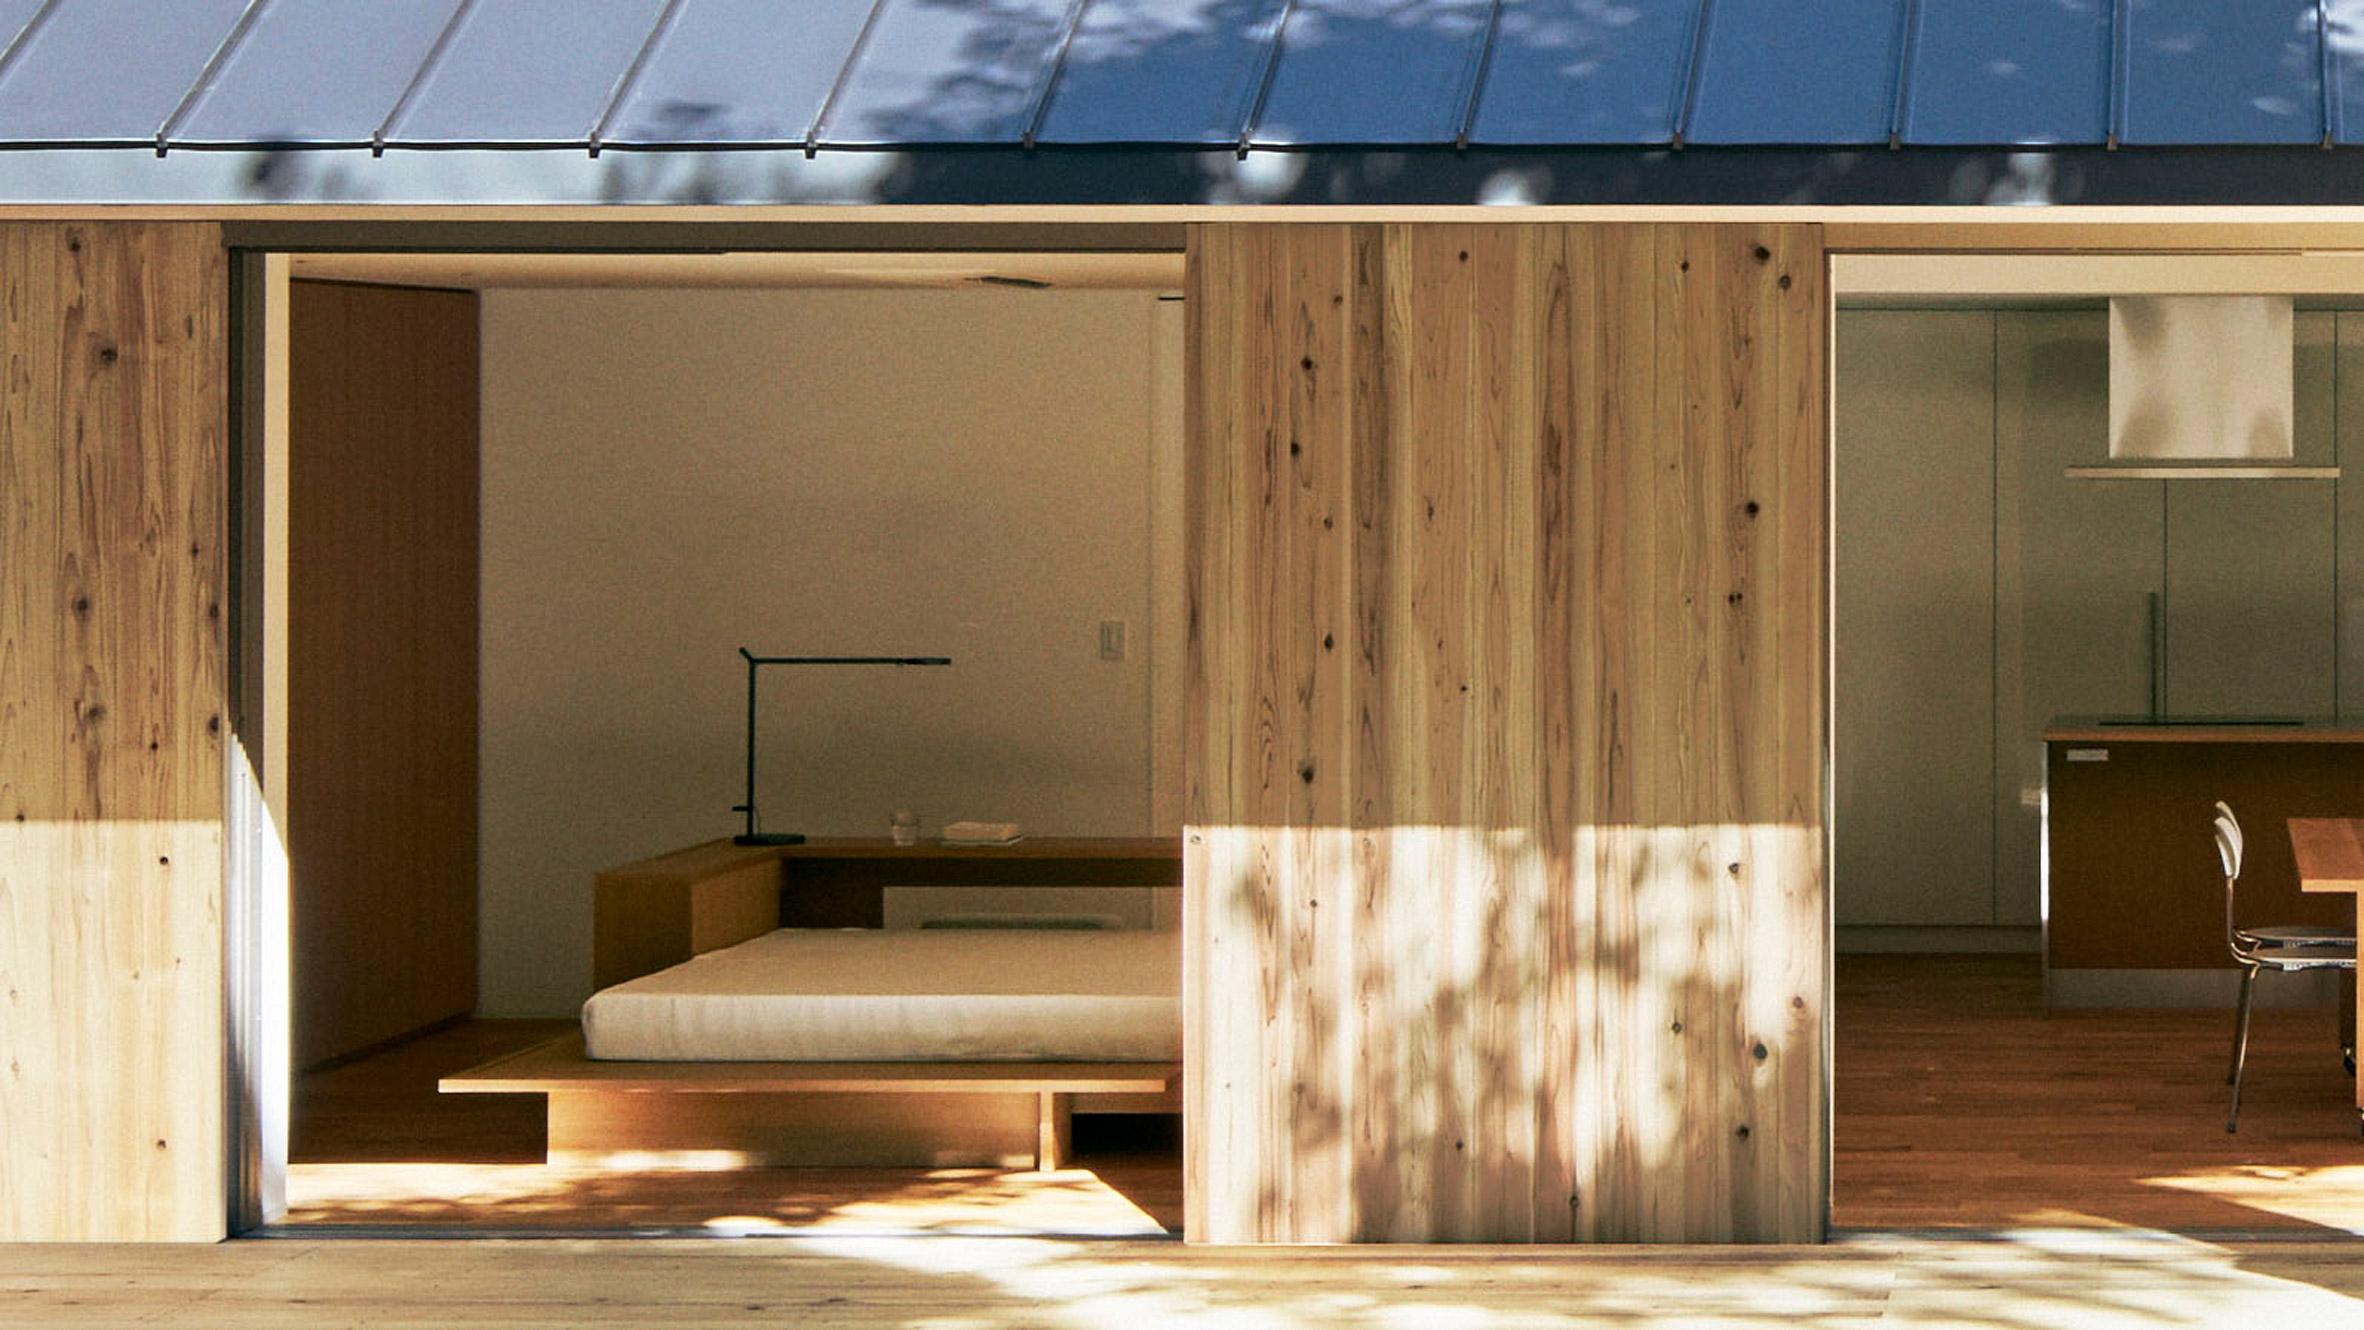 Prefabricated Yō no le home by Muji